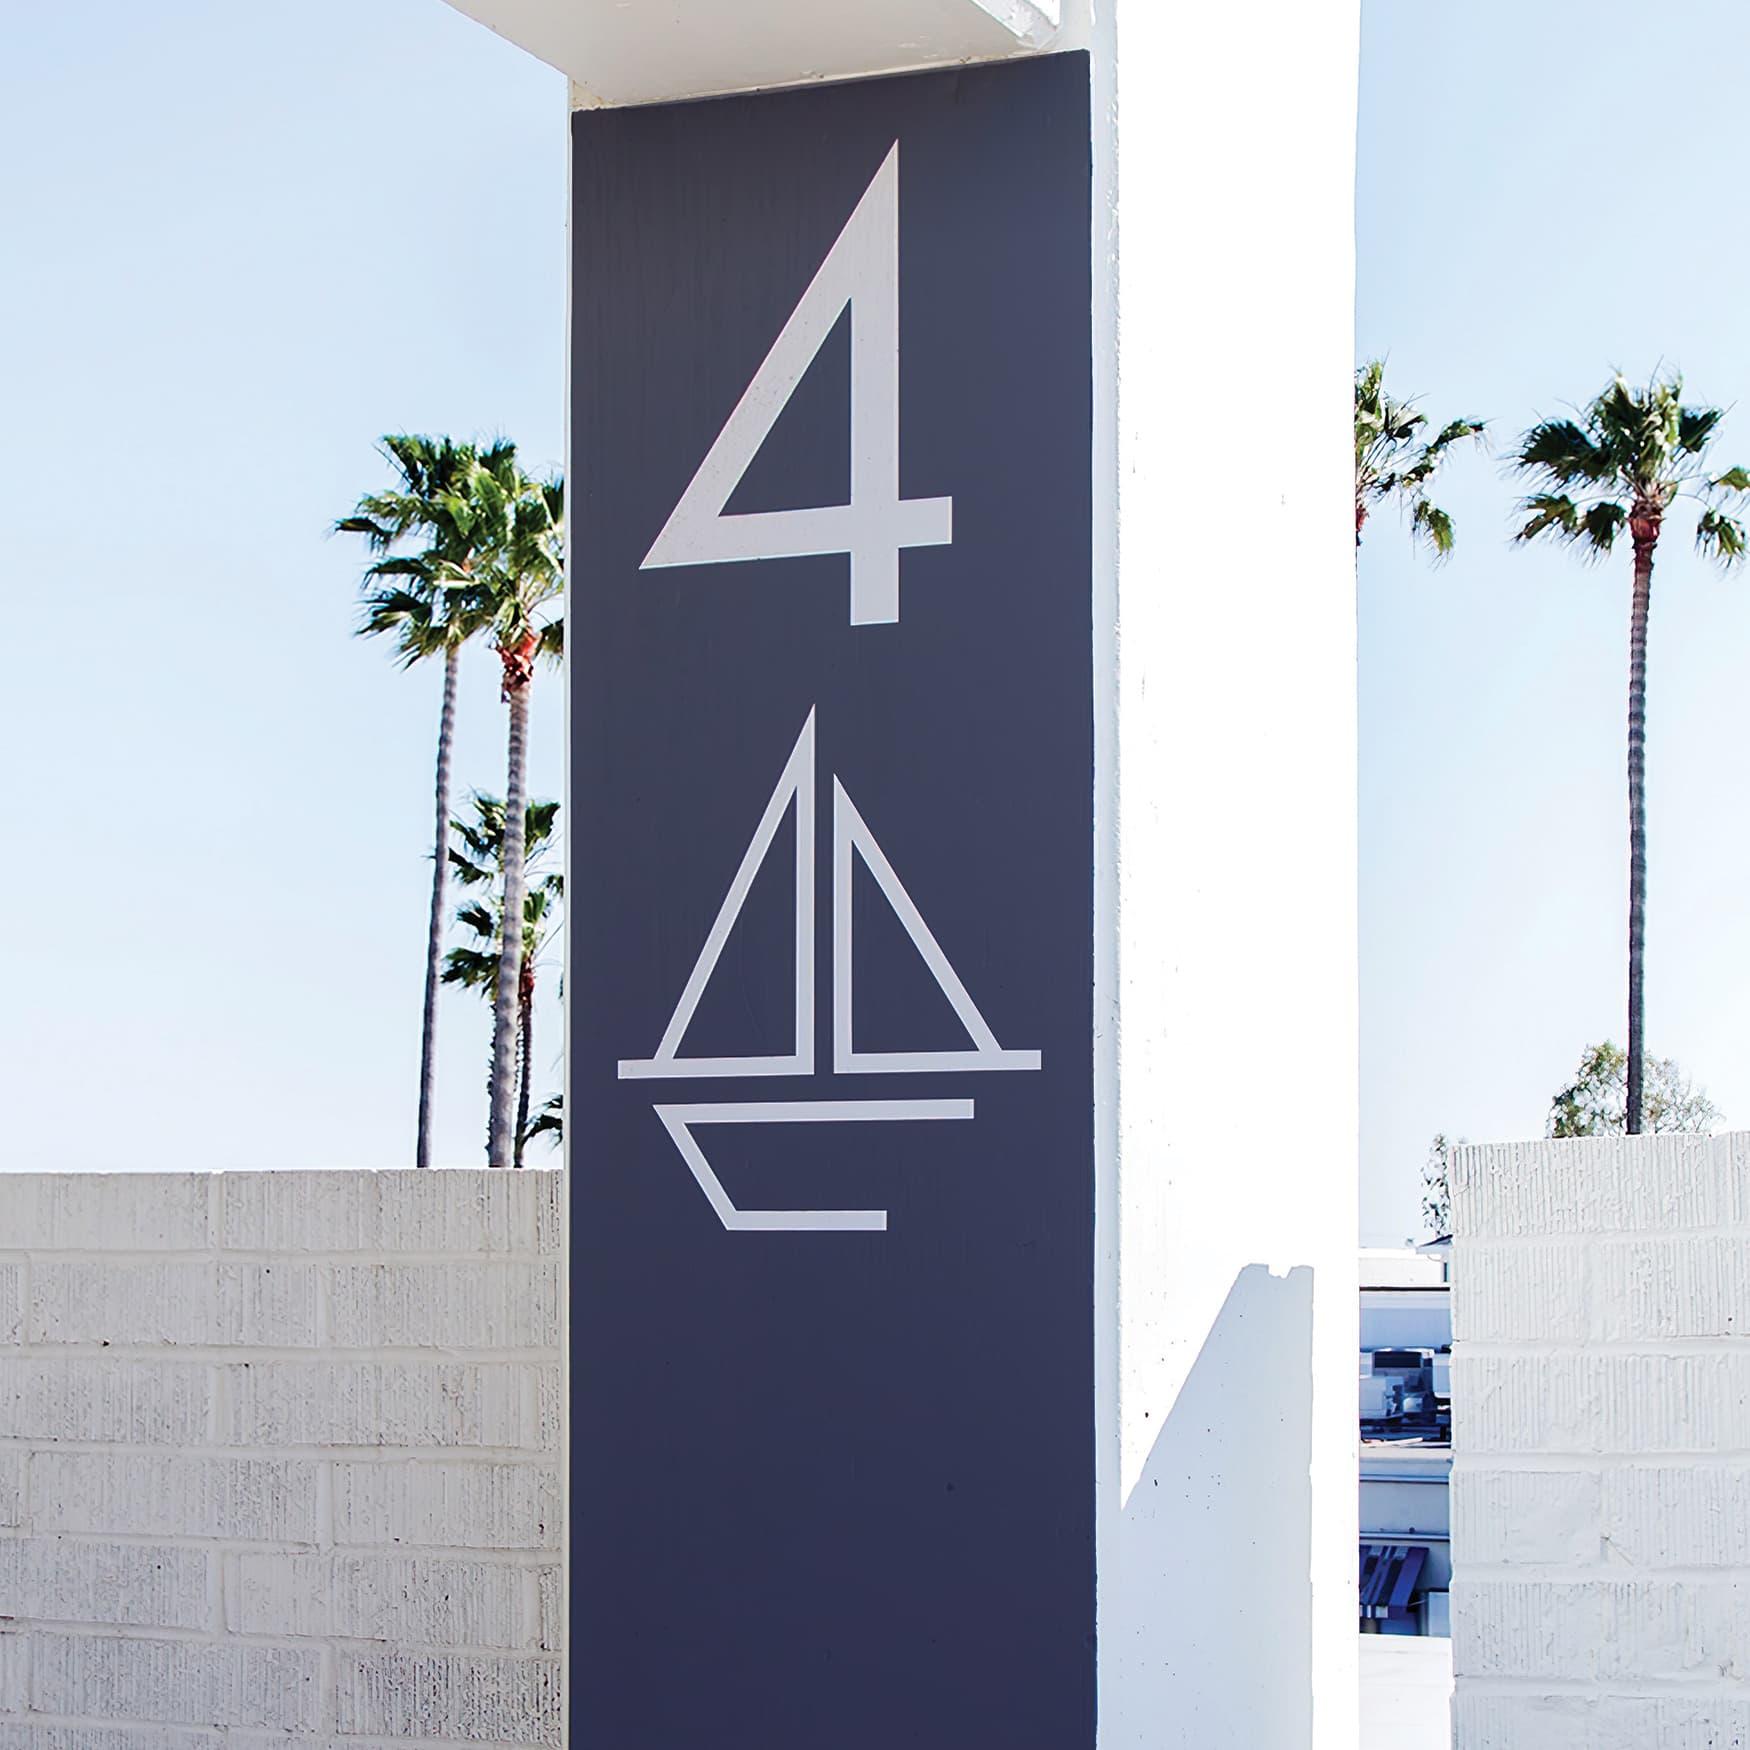 Lido Marina parking identity graphics by RSM Design